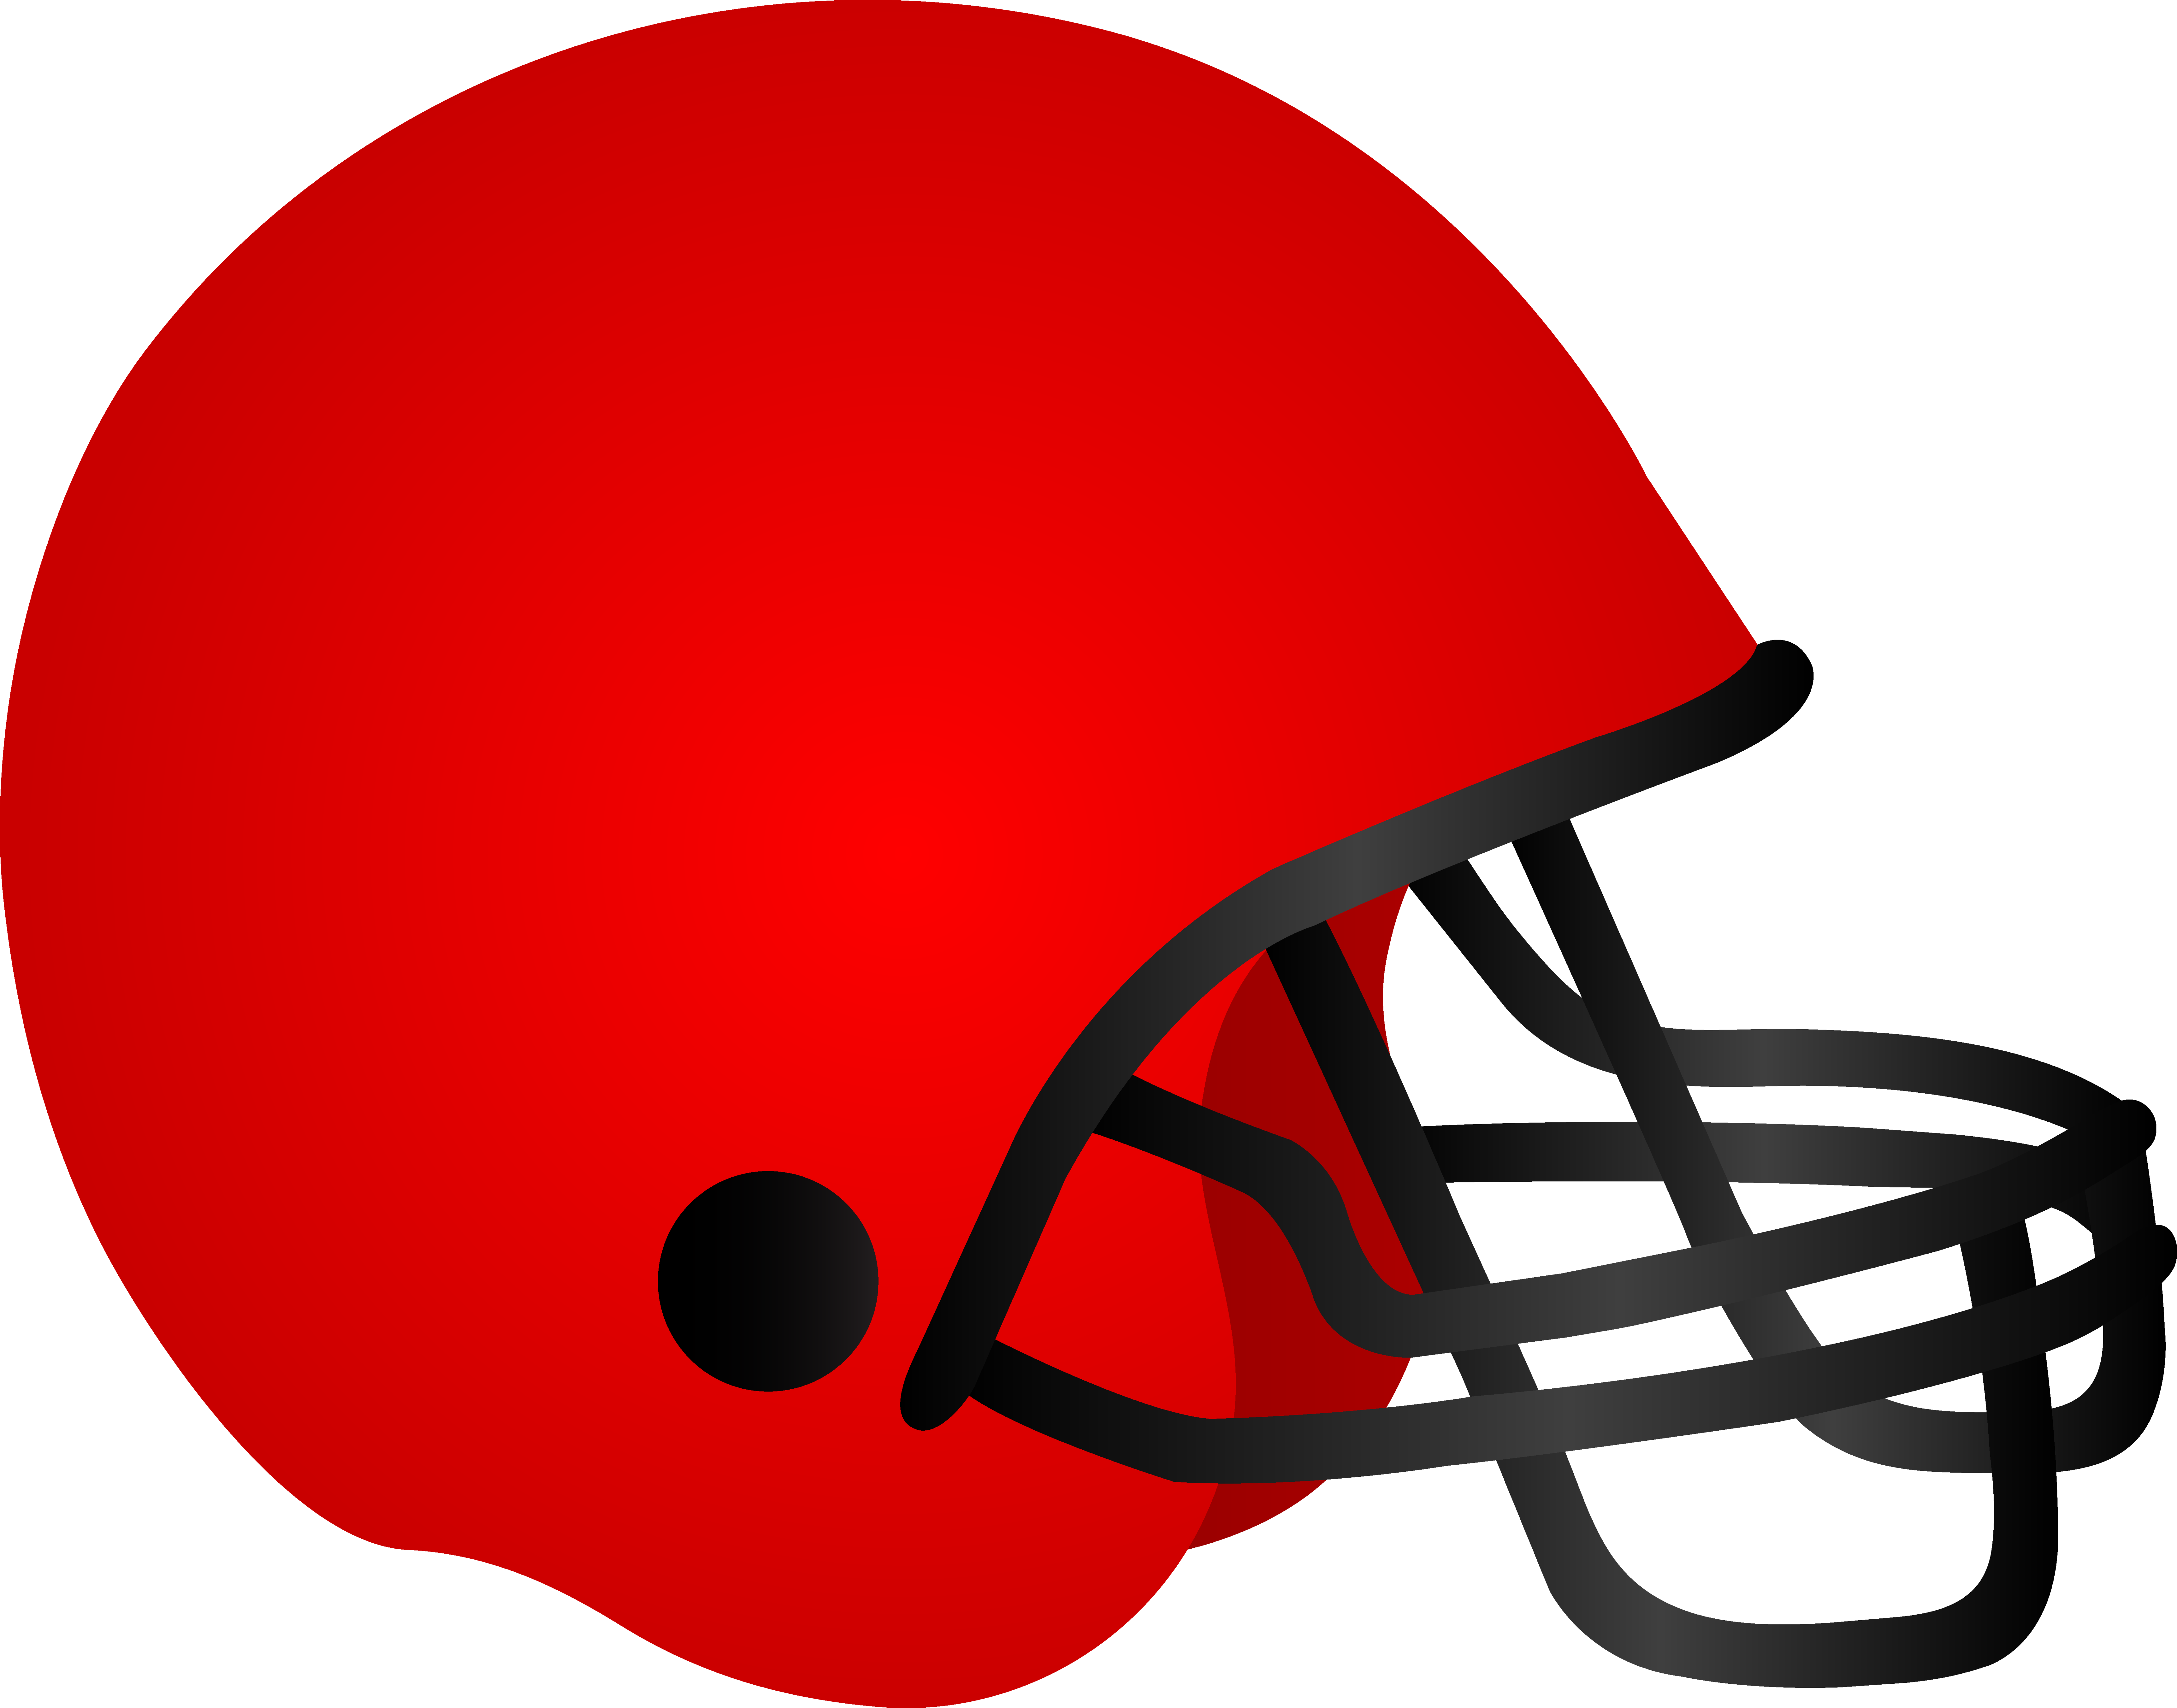 Download Red Football Helmet .